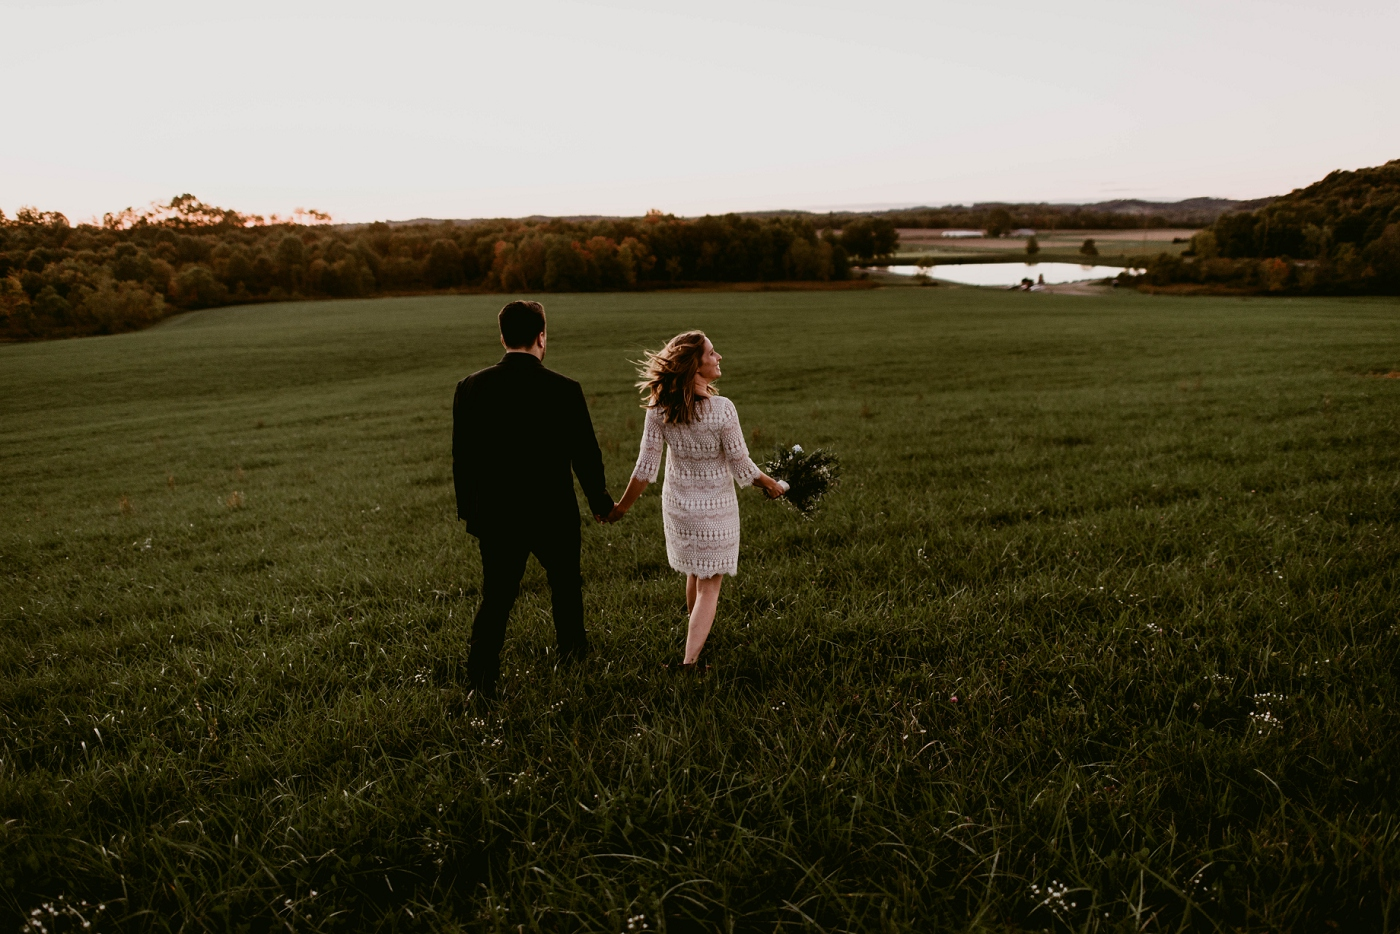 Wildflower-Field-Elopement-Vow-Renewal_Lisa+Chad_MJPHOTO-297.JPG